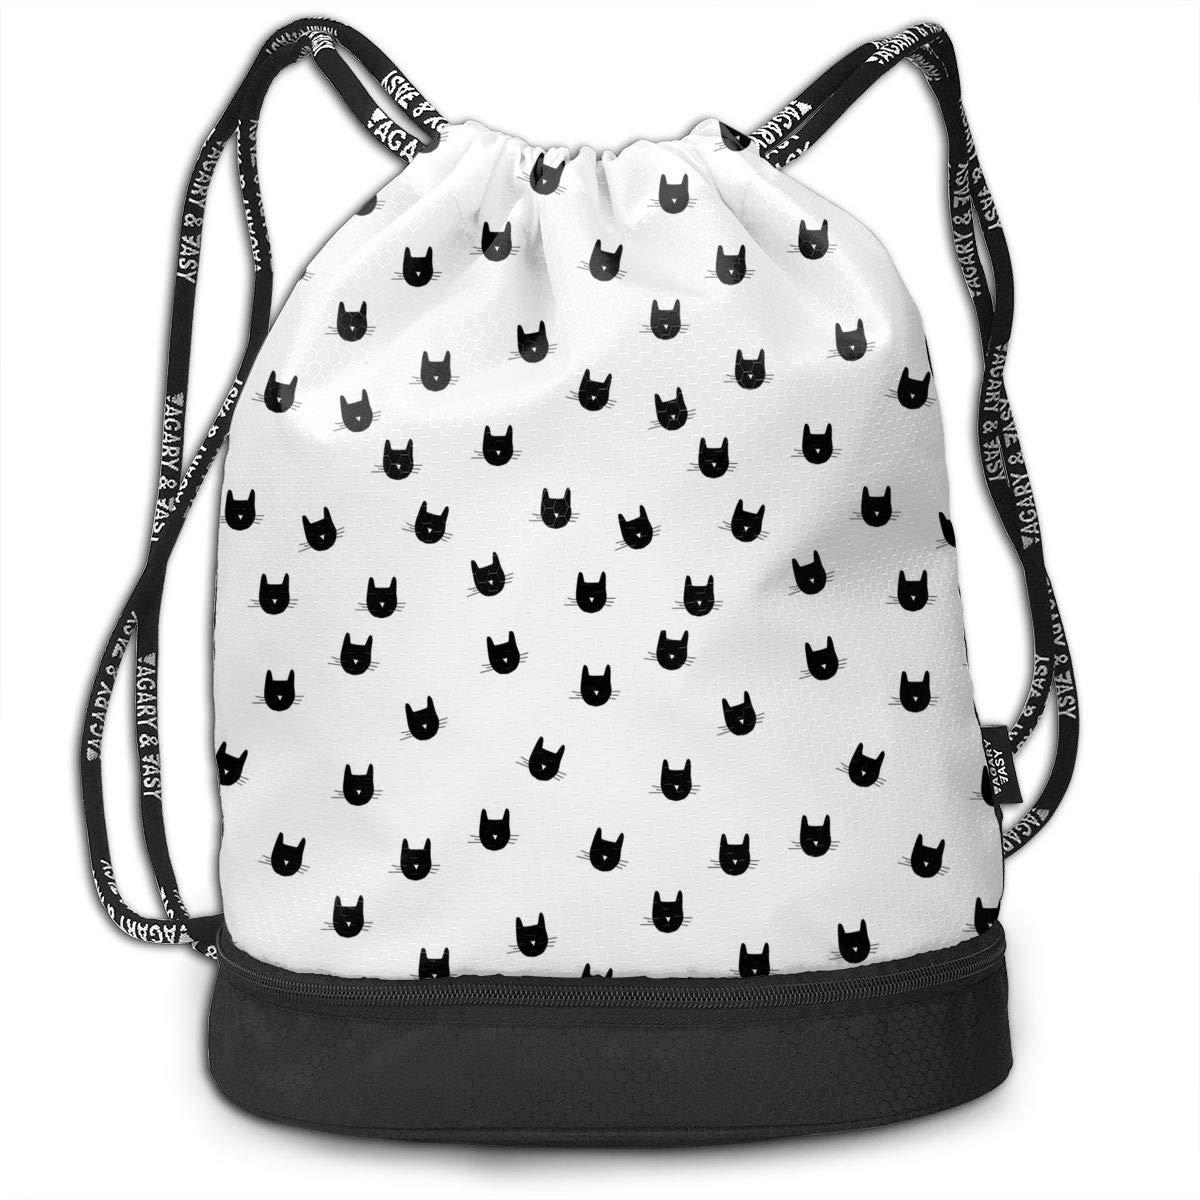 986407ded101 Amazon.com: HUOPR5Q Cat111 Drawstring Backpack Sport Gym Sack ...